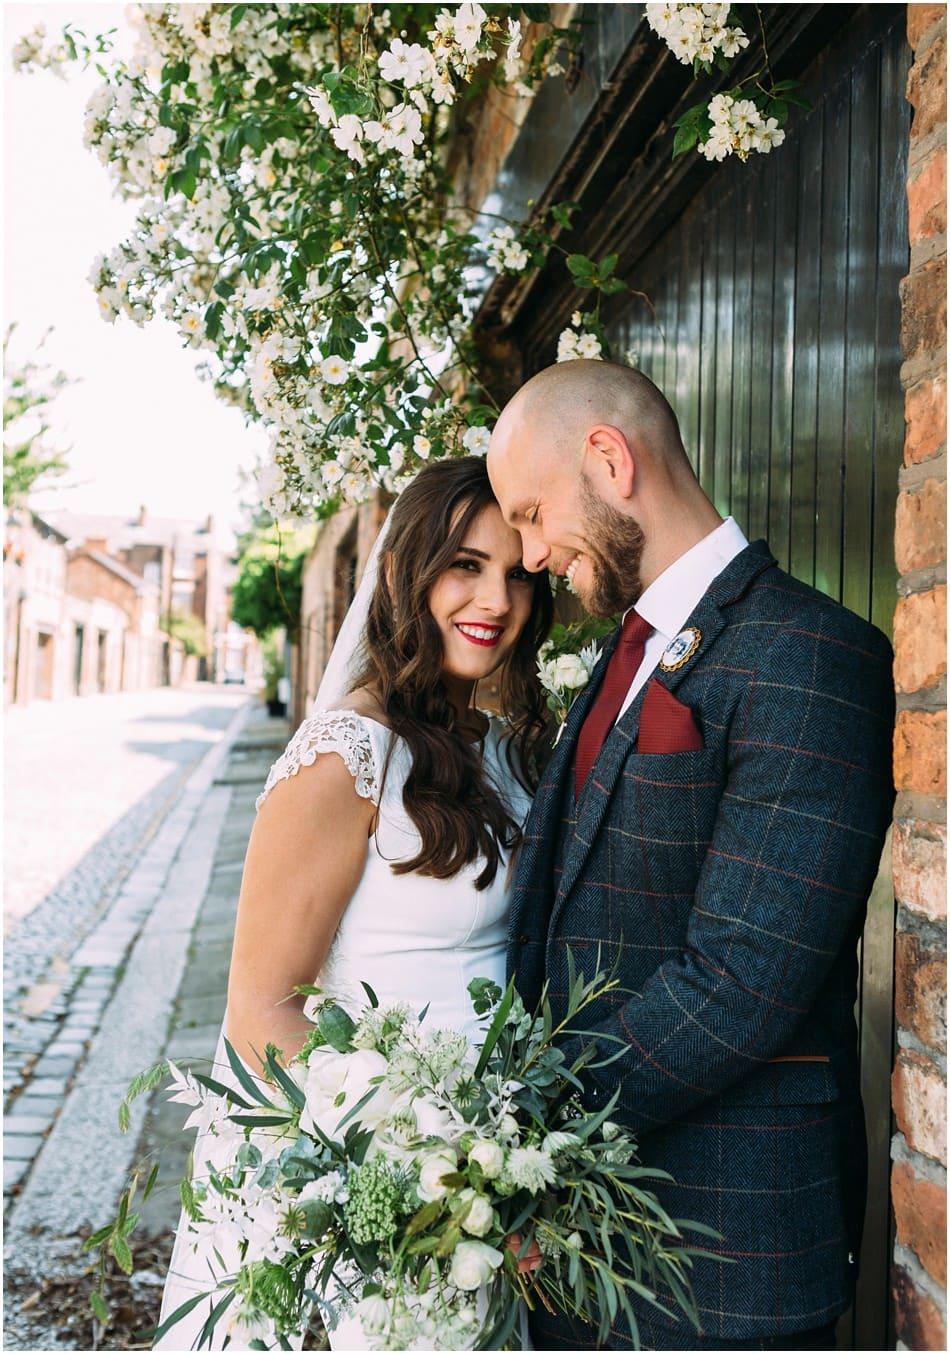 Hope Street Hotel wedding photography; Bride and Groom portrait